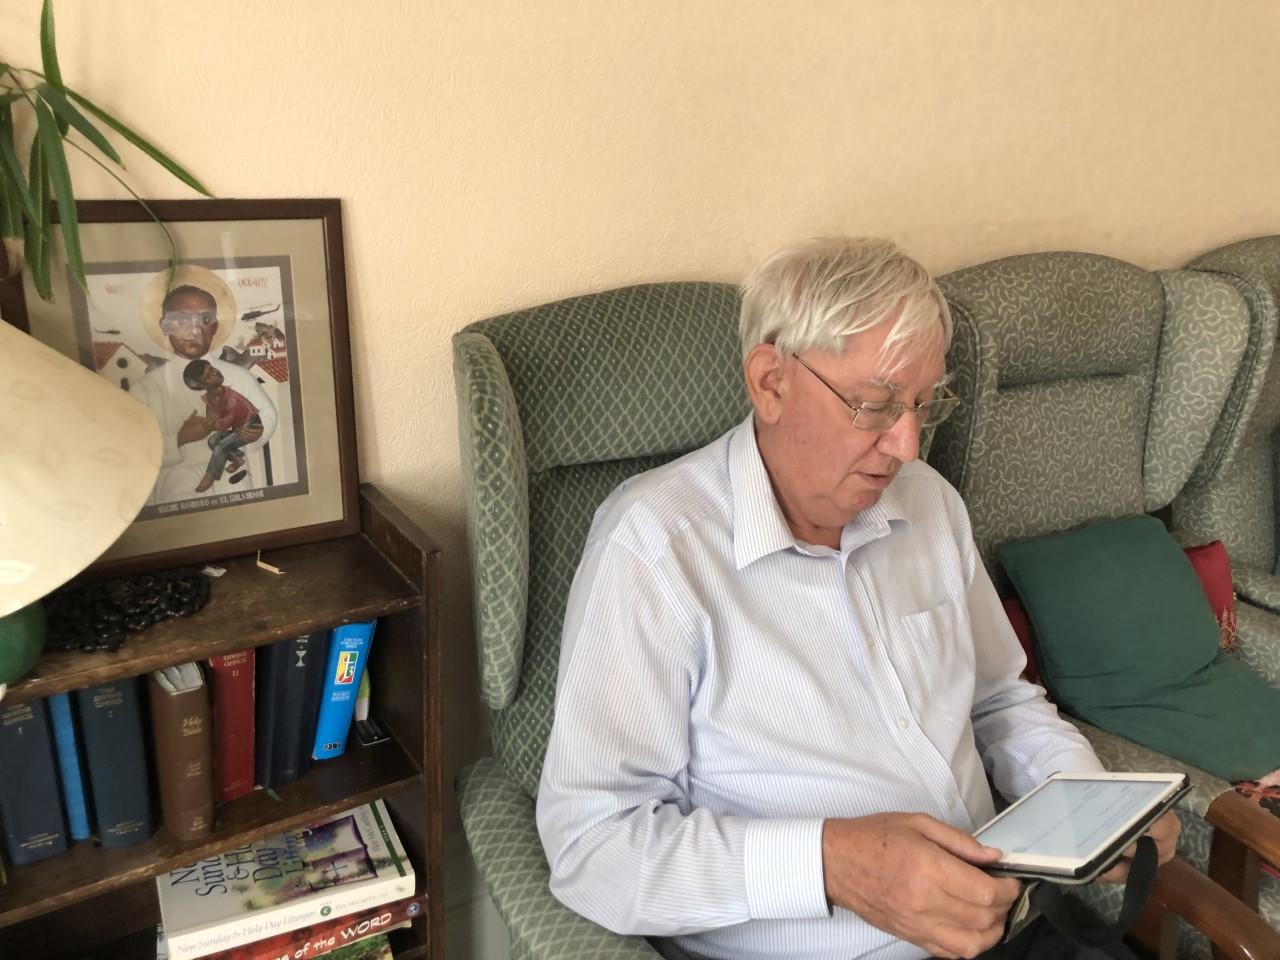 Digital prayer: the daily office on the Ipad